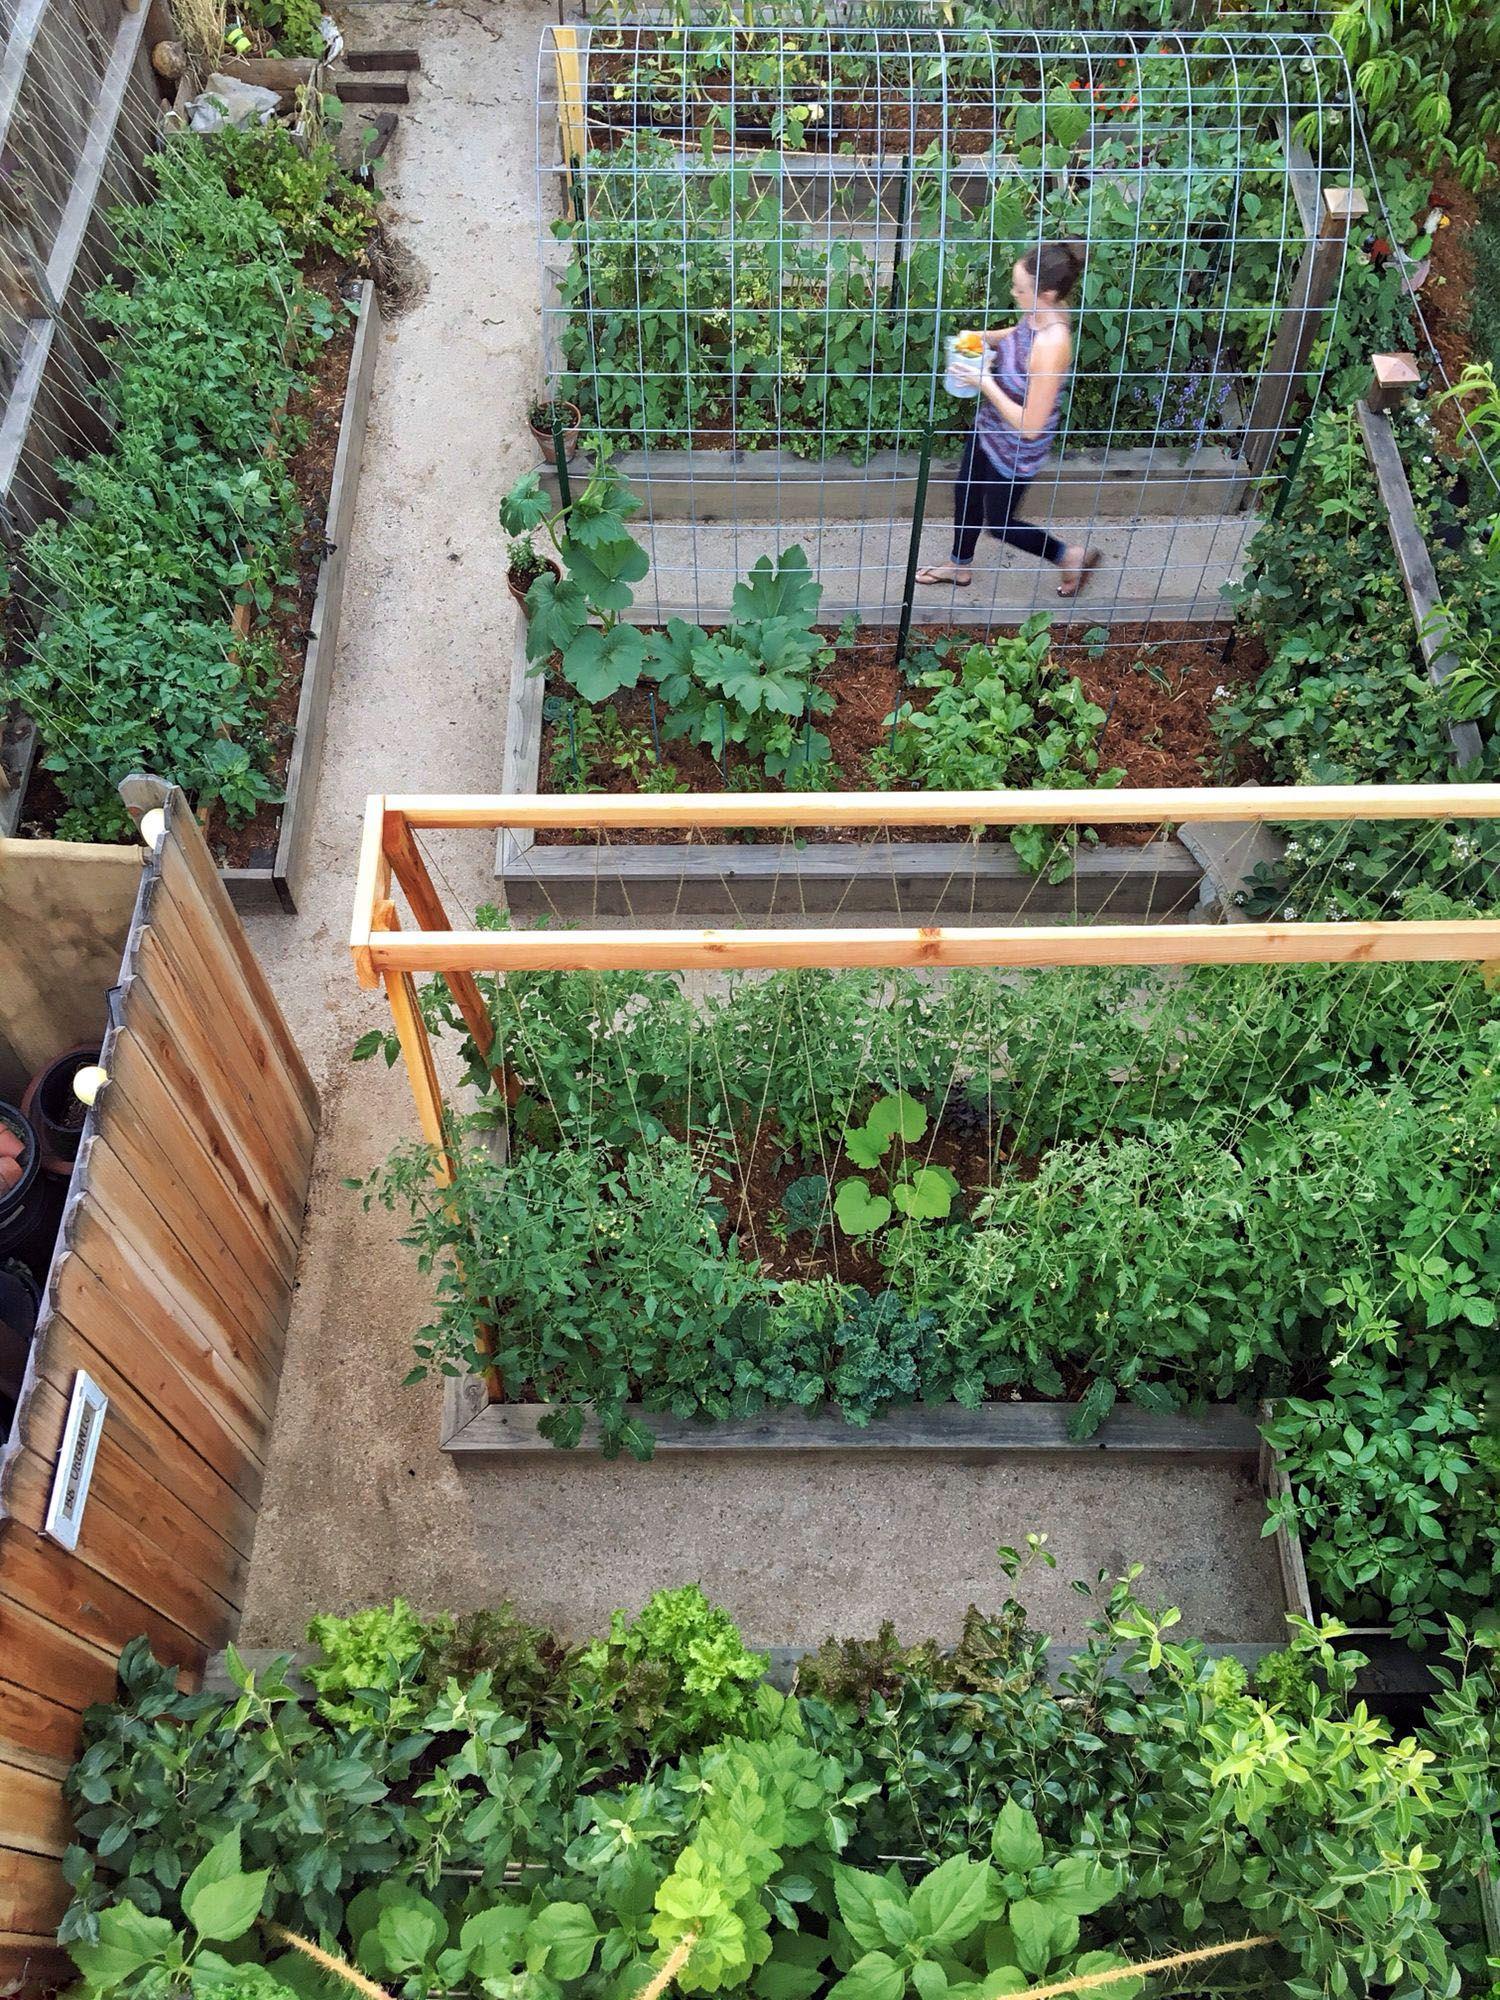 10 Lifted Garden Landscape Design Tips Vegetable garden